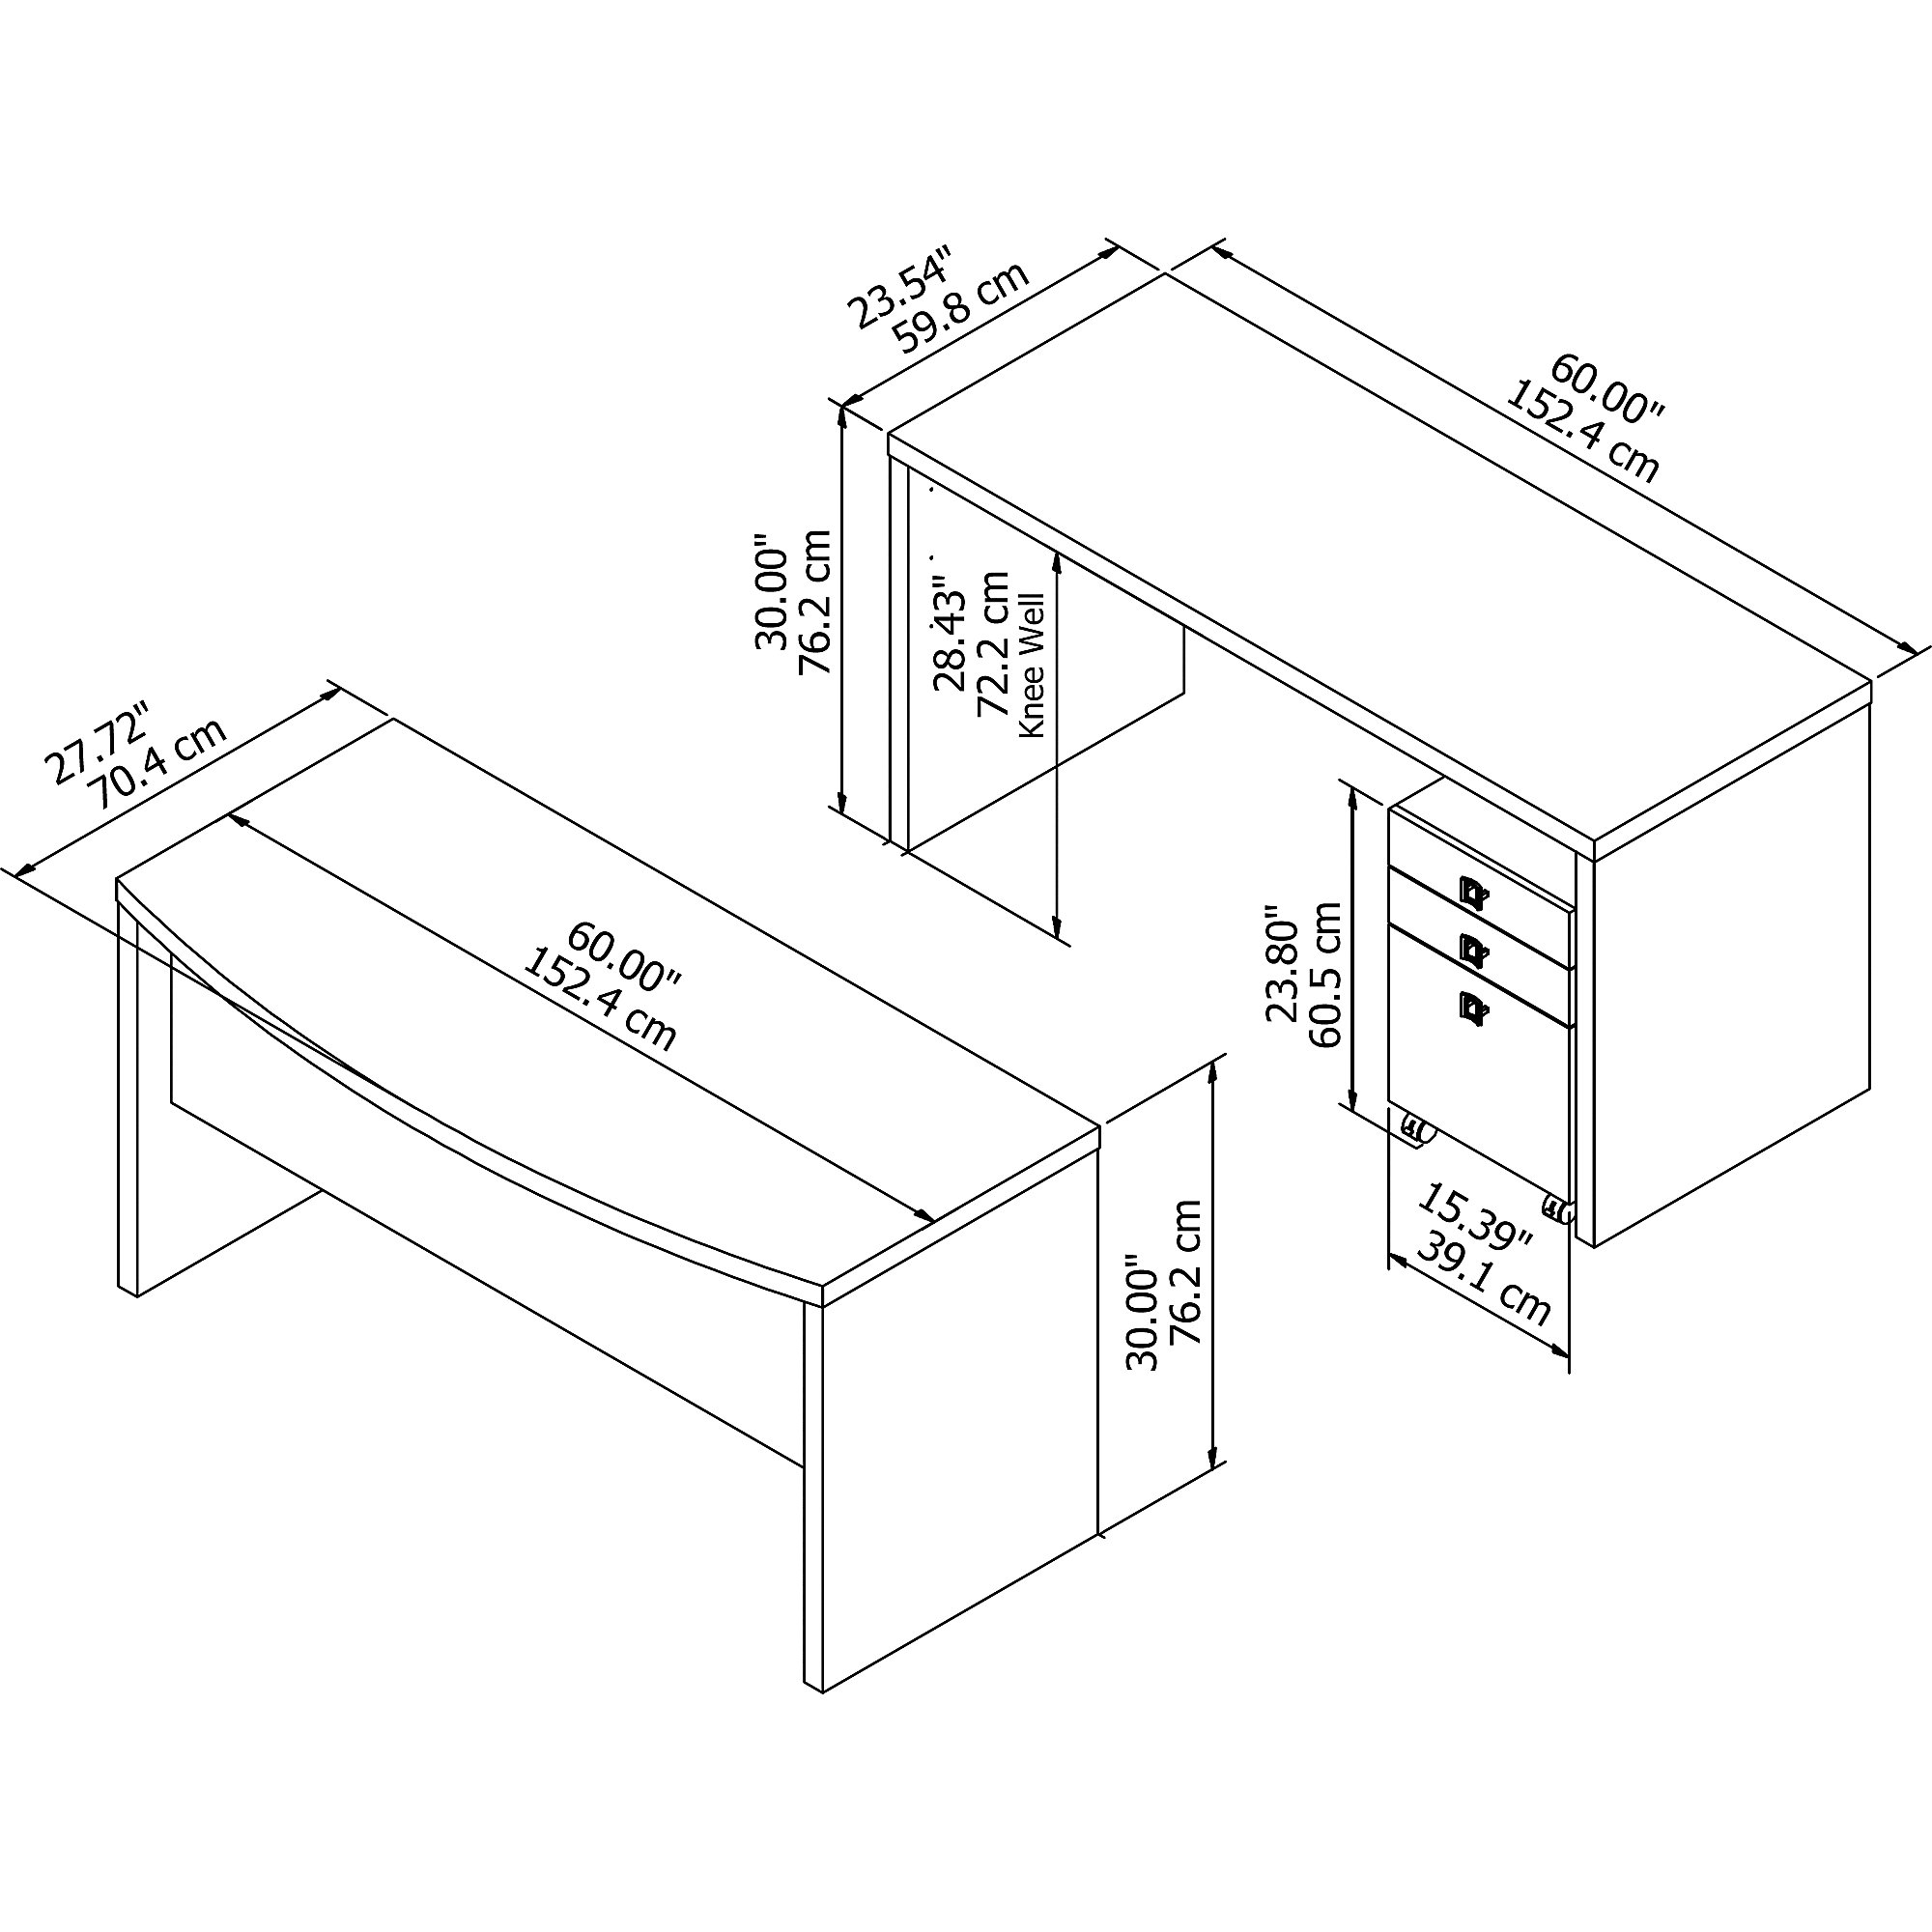 ech010 desk dimensions